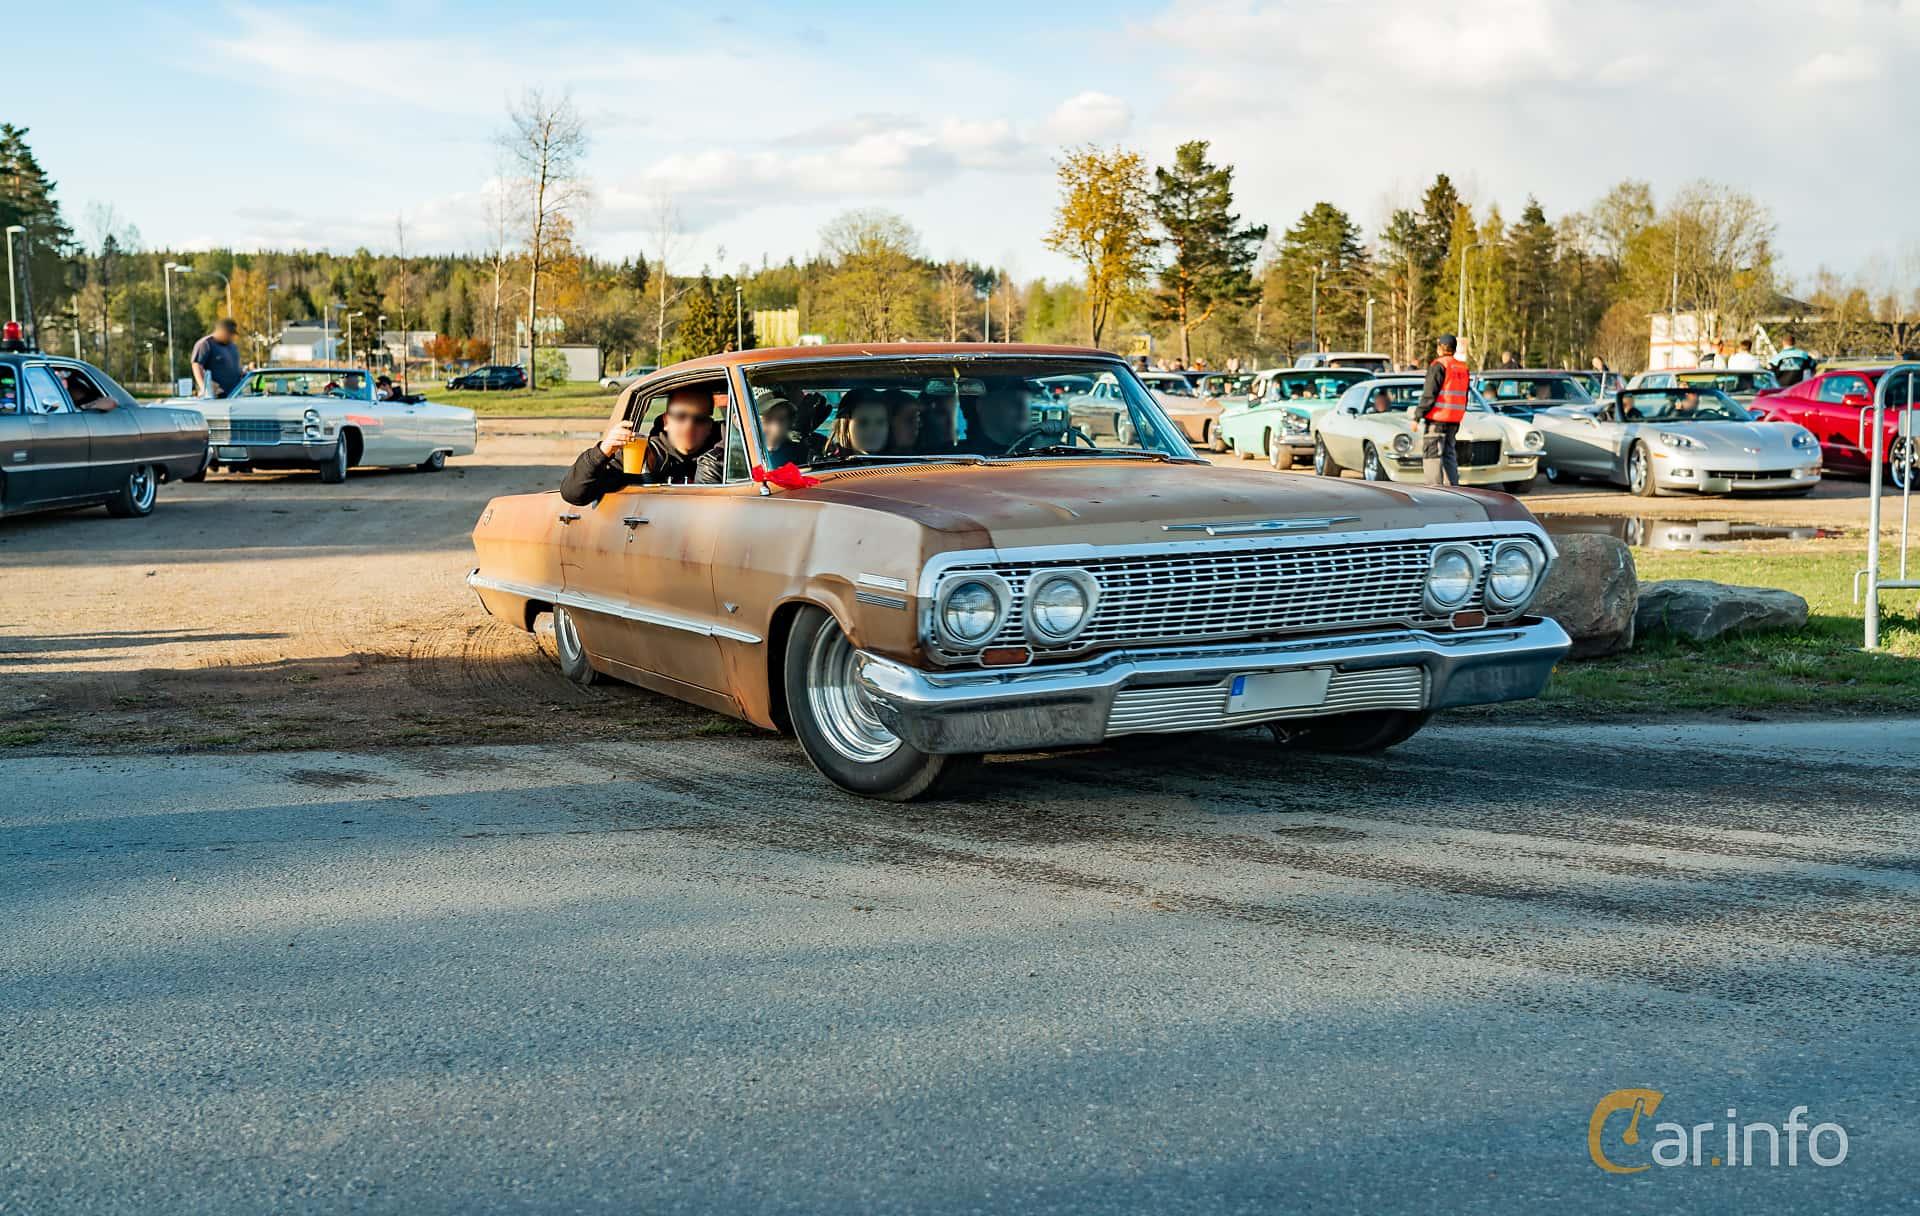 Chevrolet Impala Sport Sedan 4.6 V8 Powerglide, 198hp, 1963 at Wheelers Cruising, Vetlanda 2019